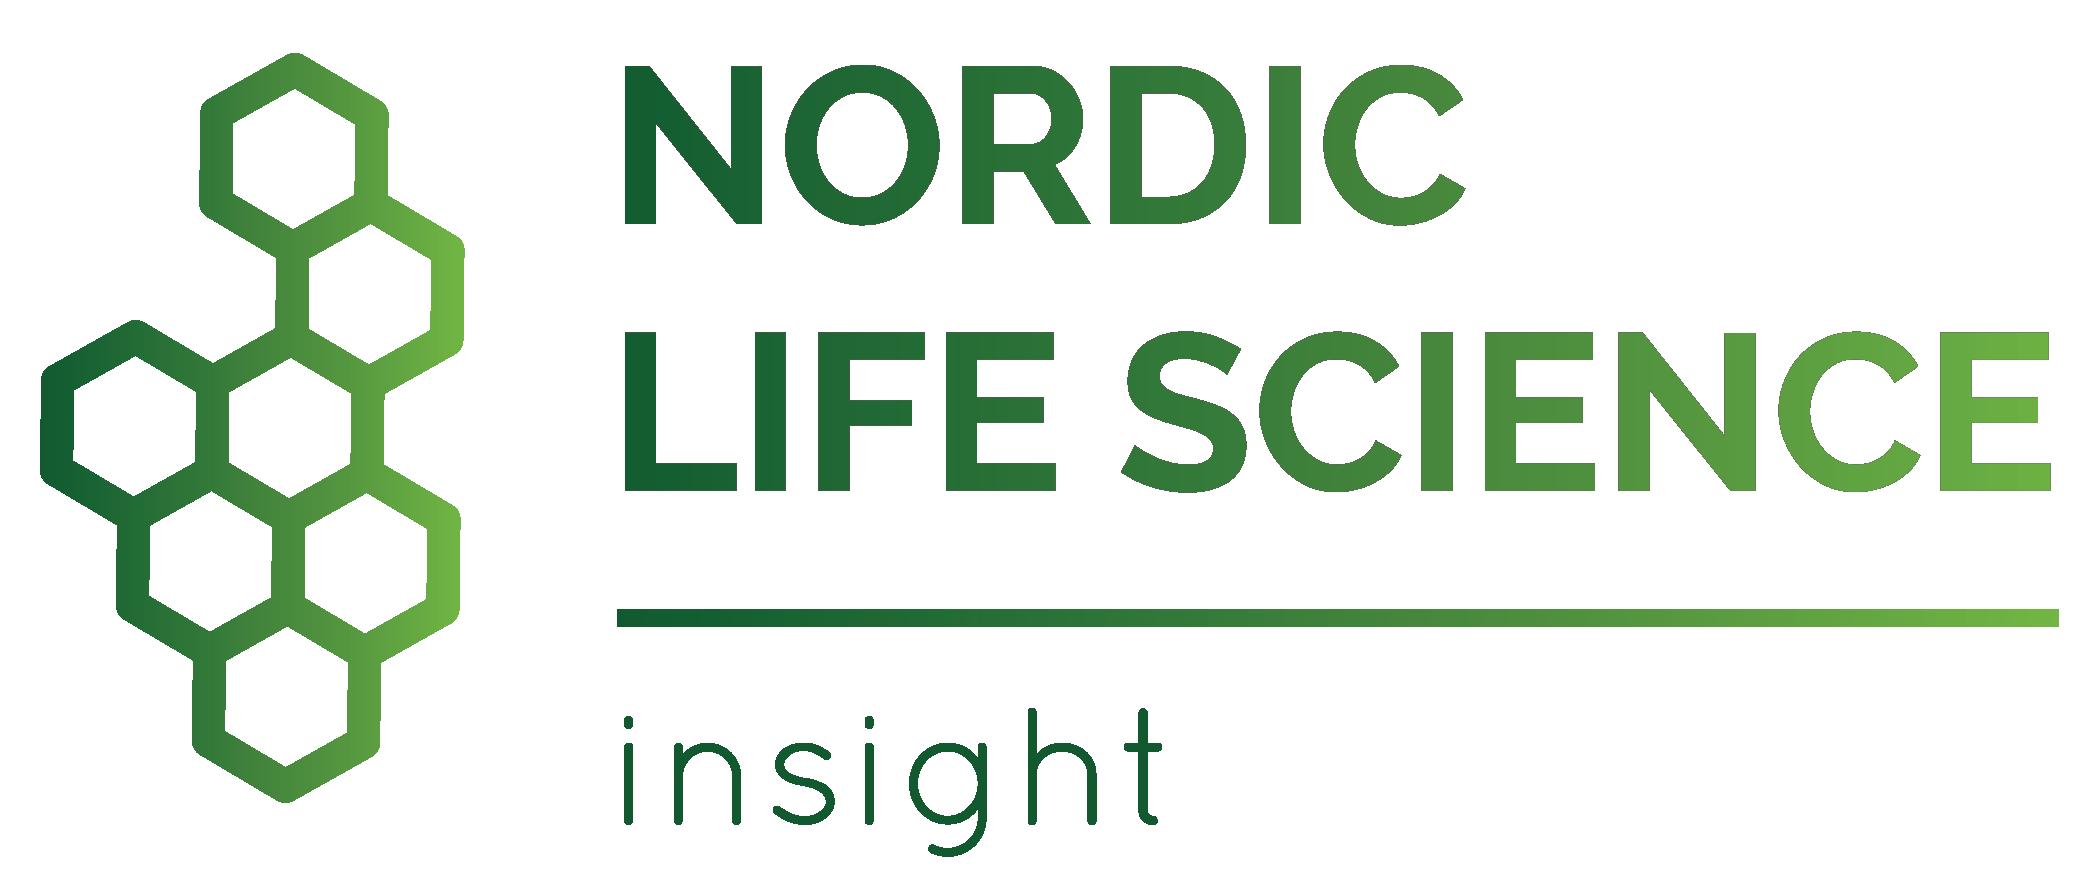 Nordic Life Science Insight Brand Logo